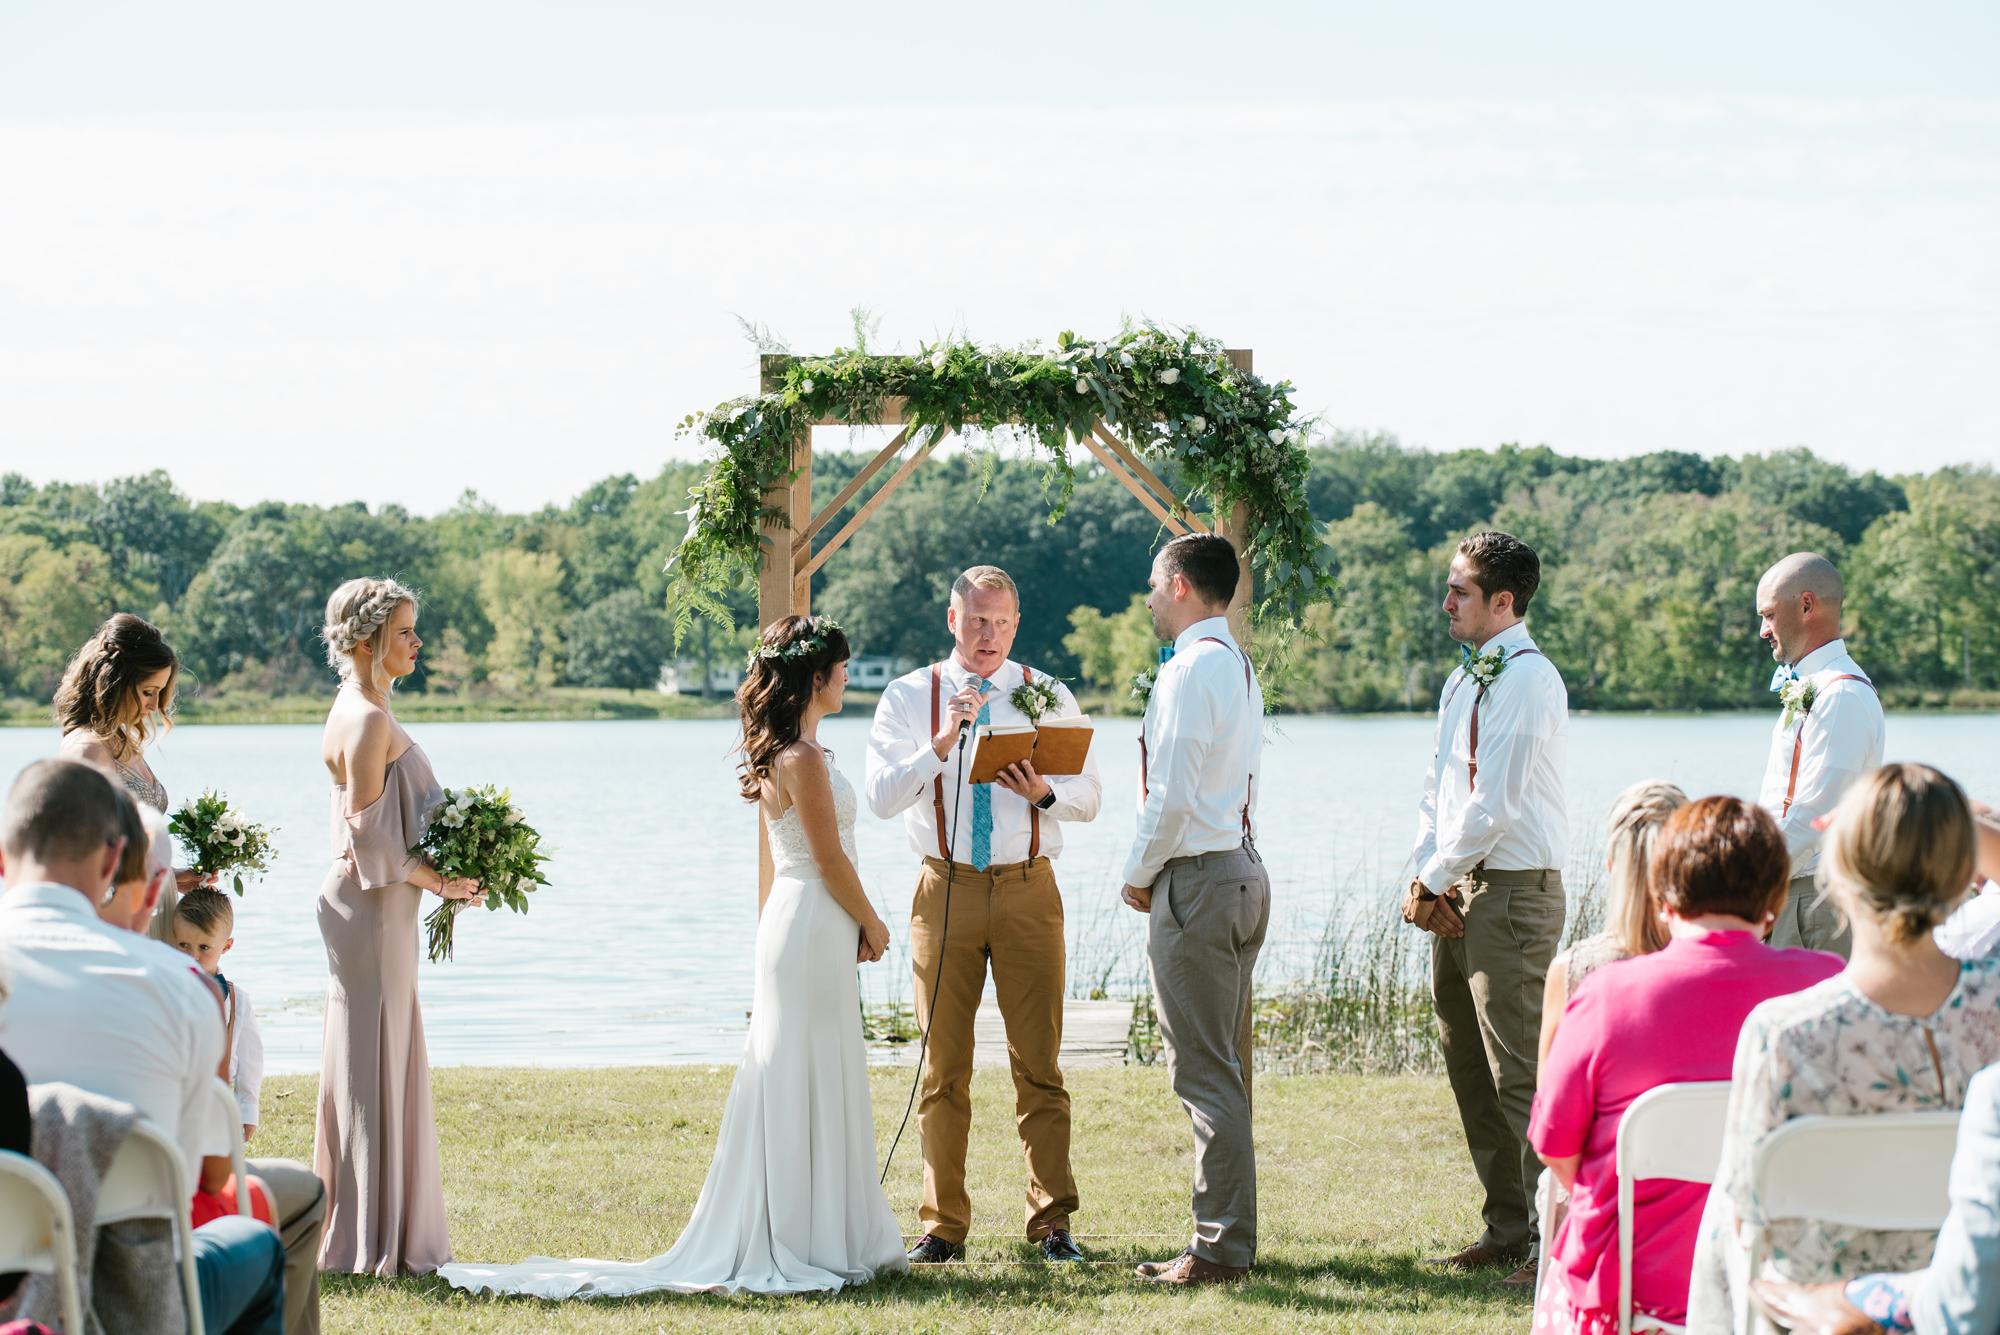 Quincy-Coldwater-Michigan-farm-wedding-photogapher-sydney-marie (111).jpg